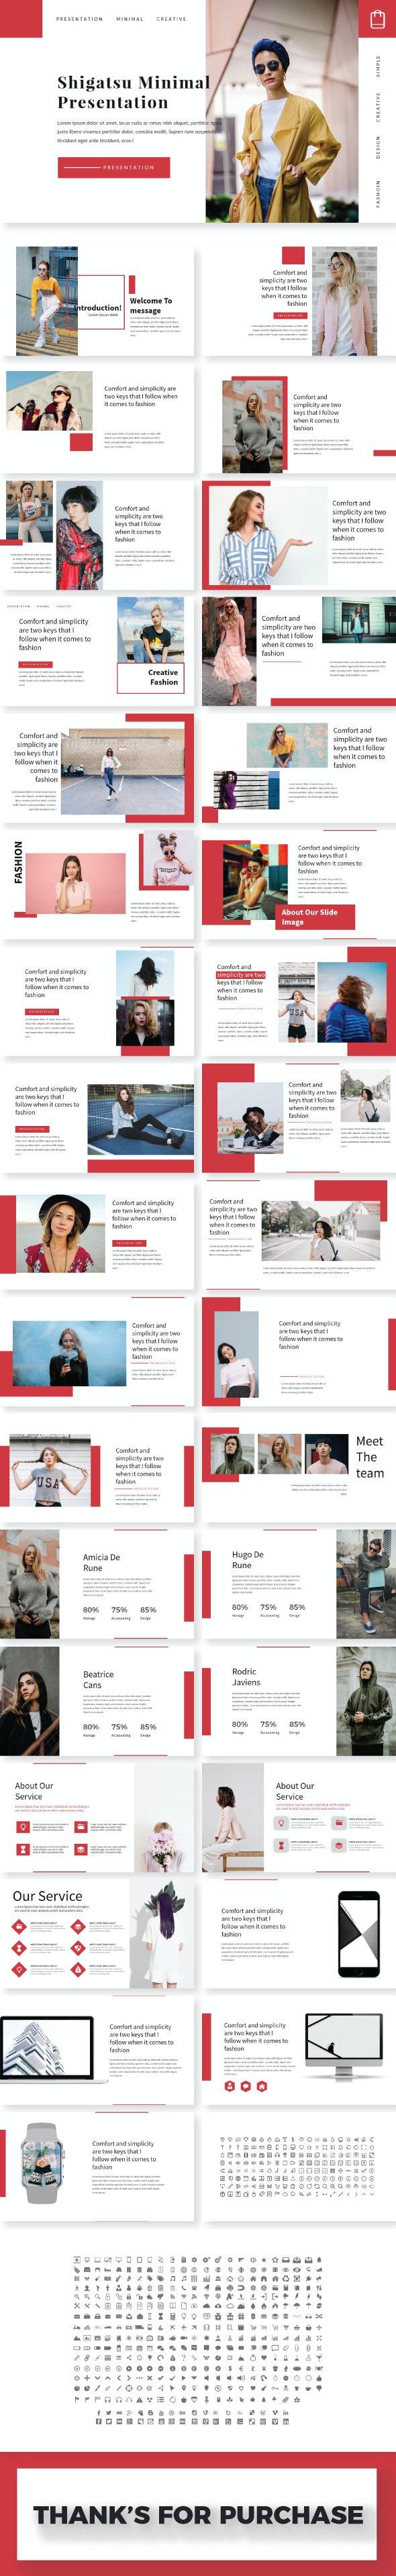 Shigatsu Presentation Template - Creative PowerPoint Templates